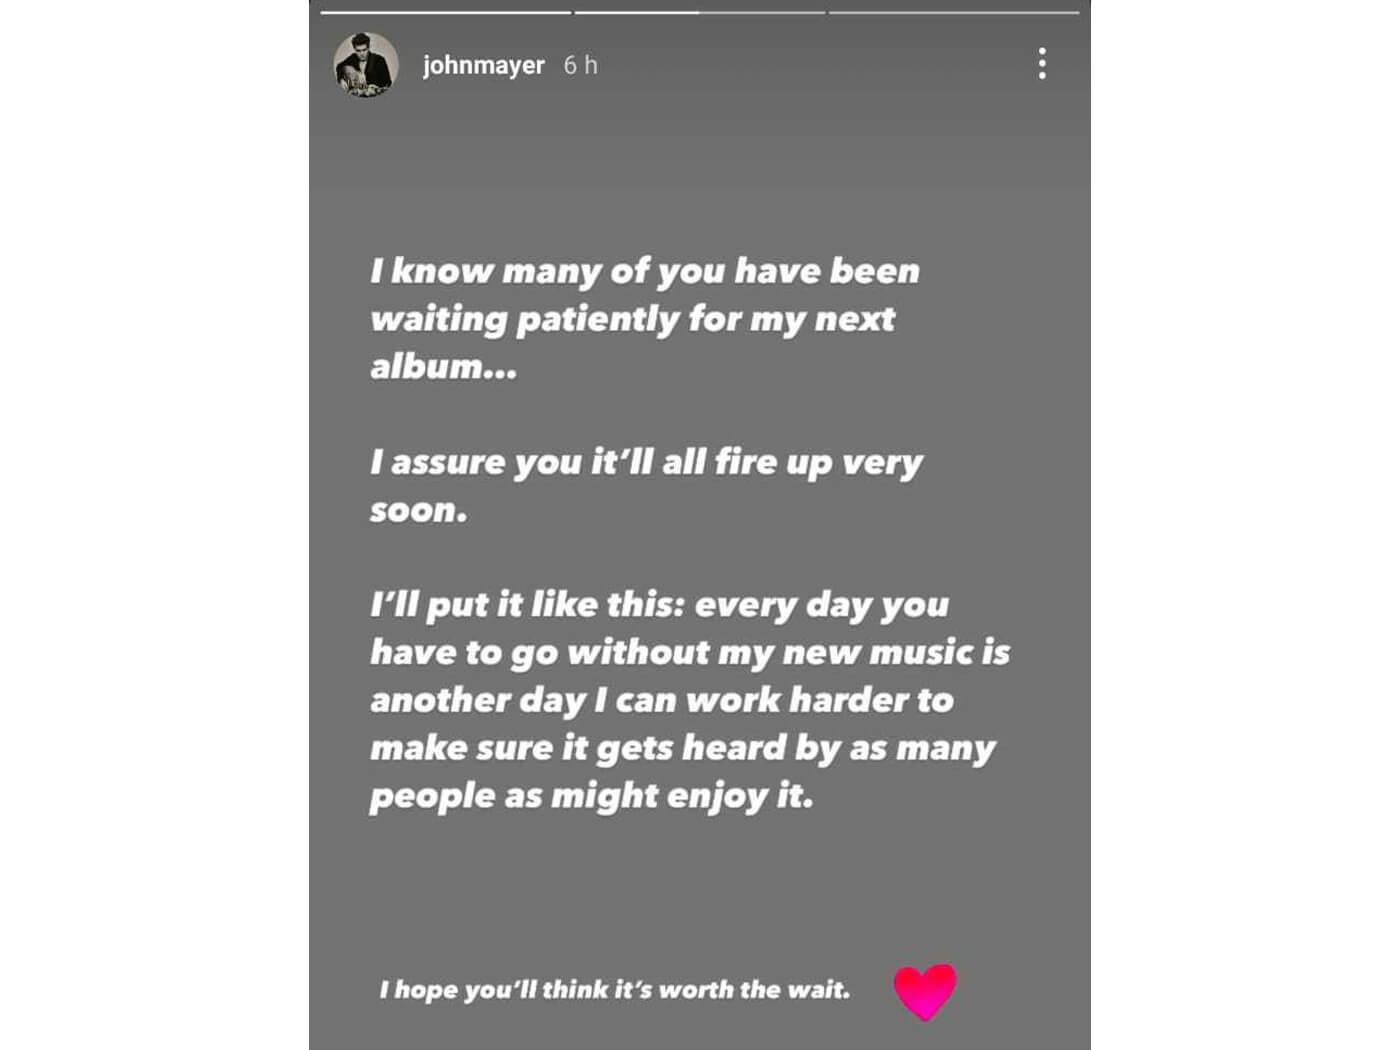 John Mayer album statement IG Story